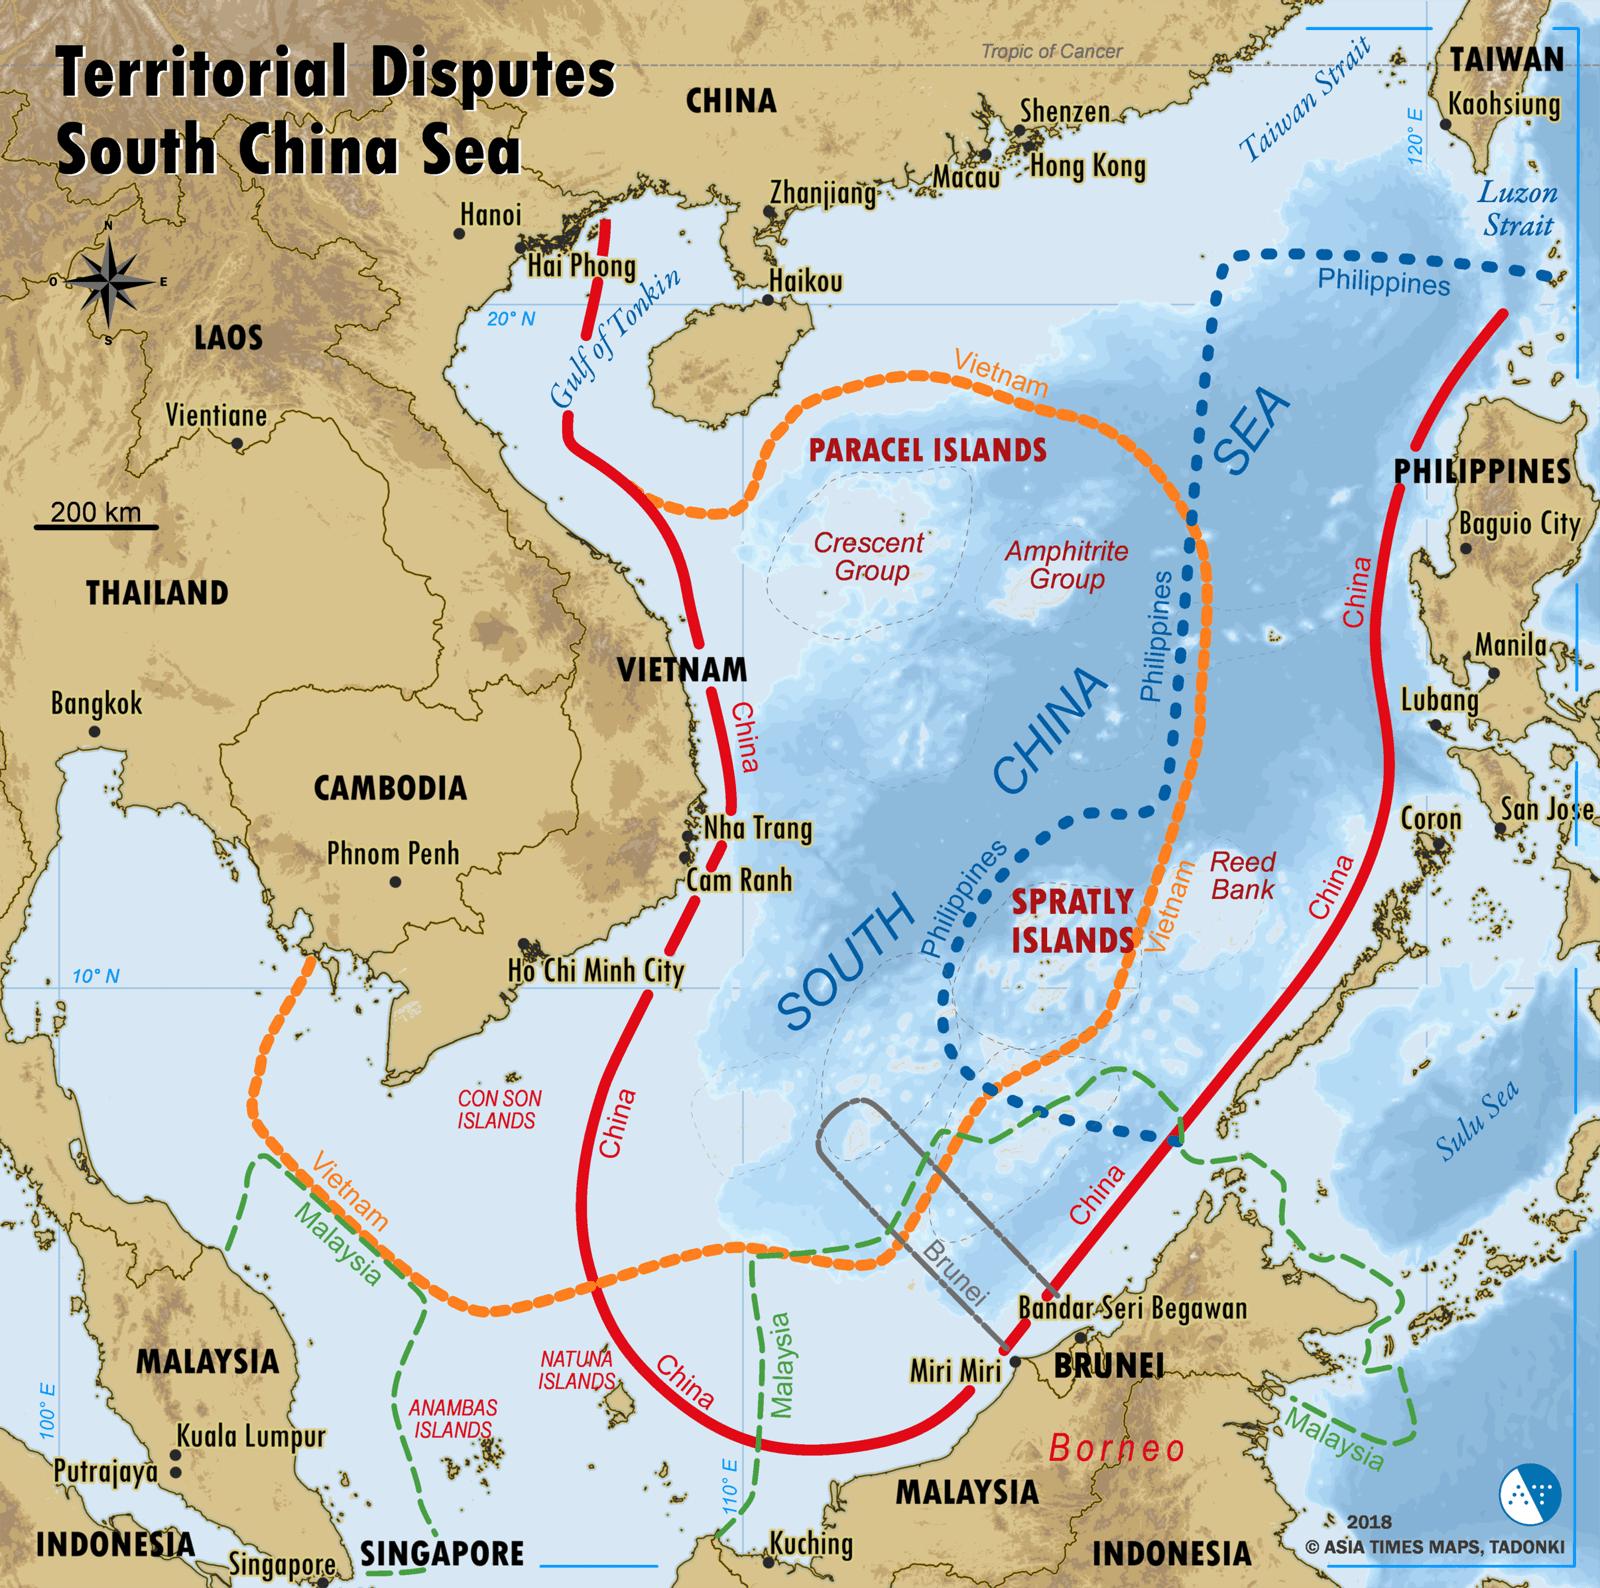 south-china-sea_atmaps_2018_small-b